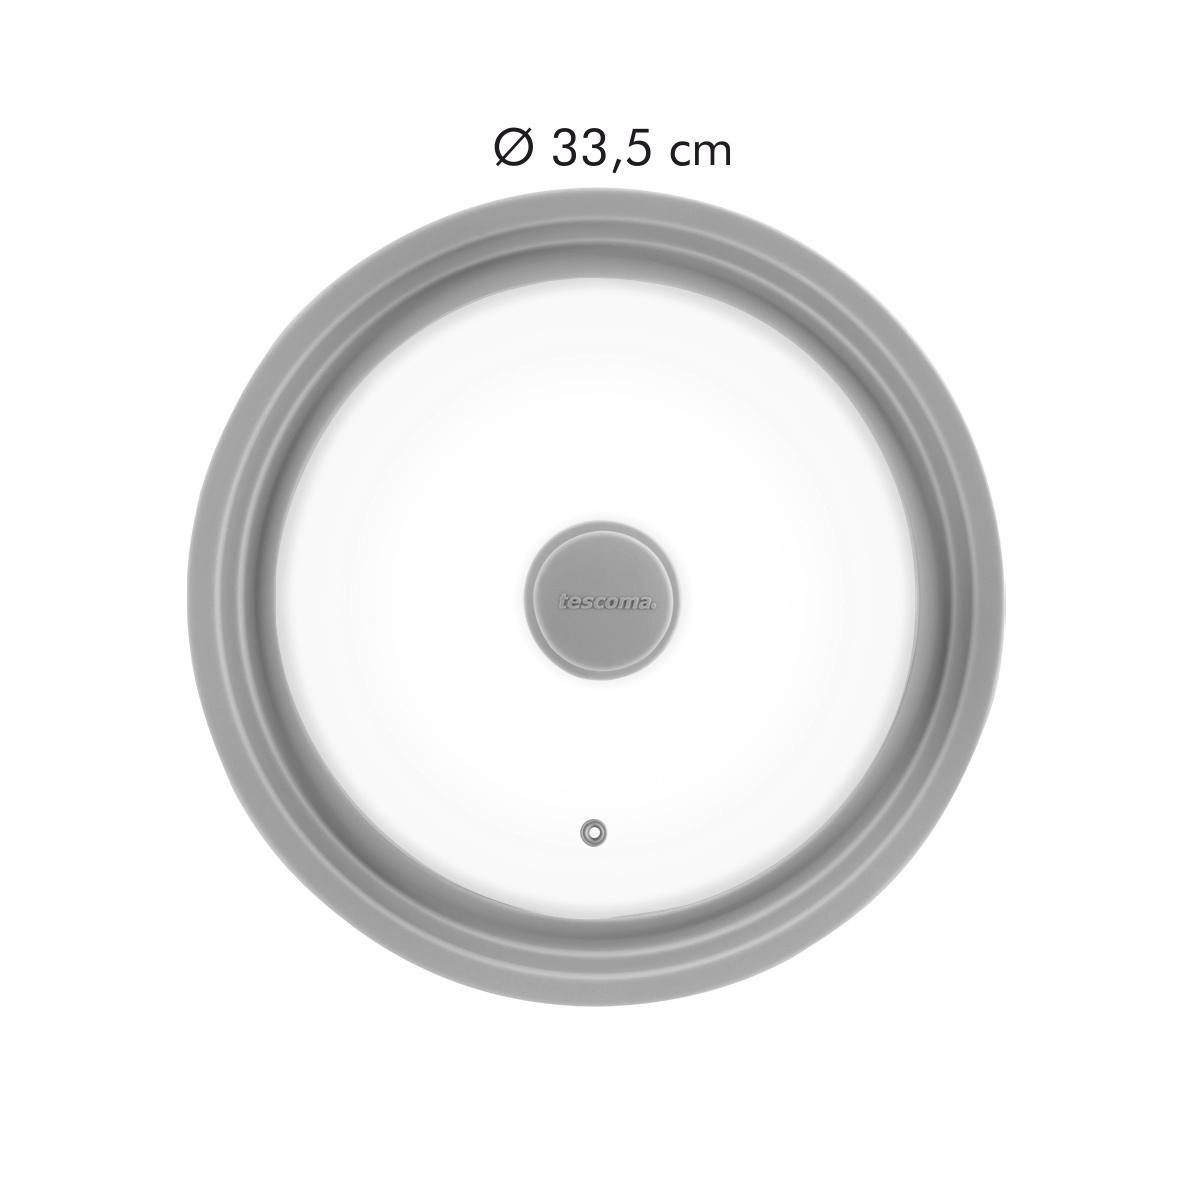 Poklice UNICOVER ø 28, 30, 32 cm